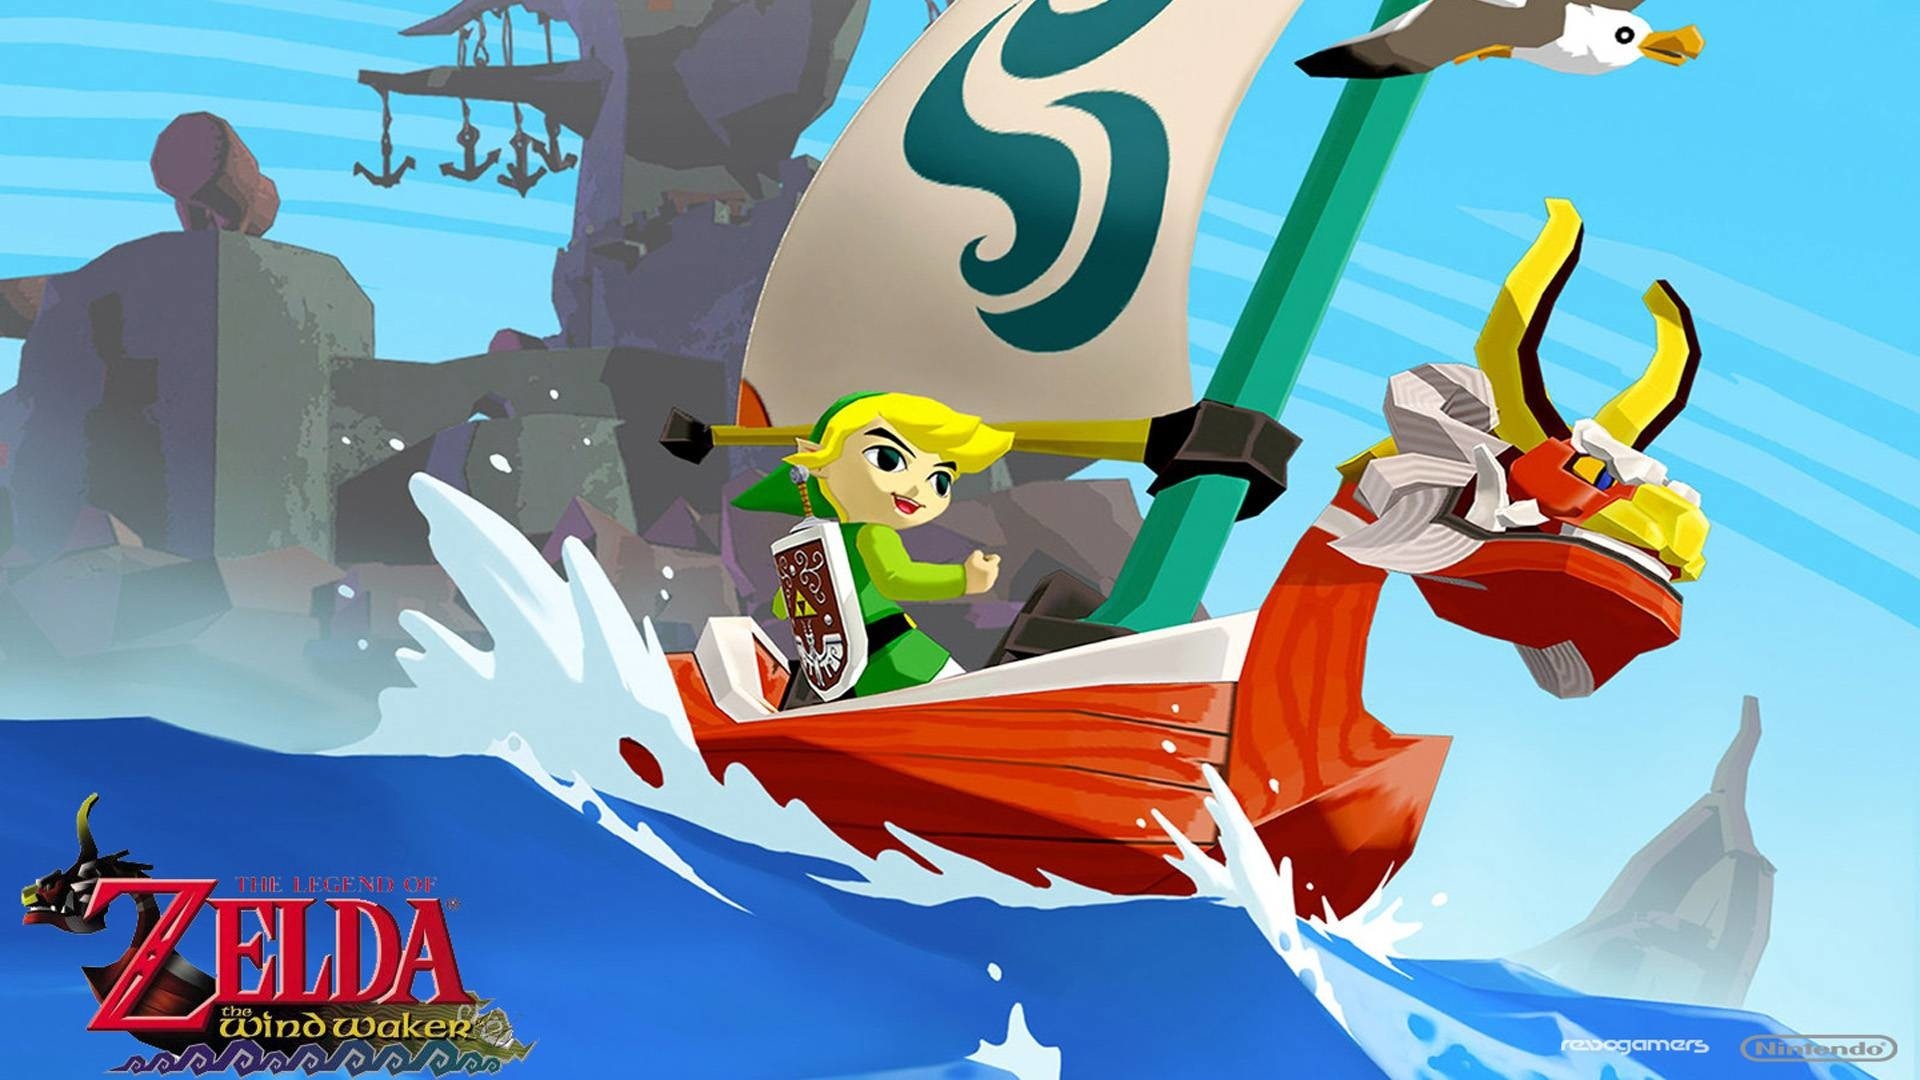 The Legend Of Zelda: The Wind Waker Hd Computer Wallpapers .